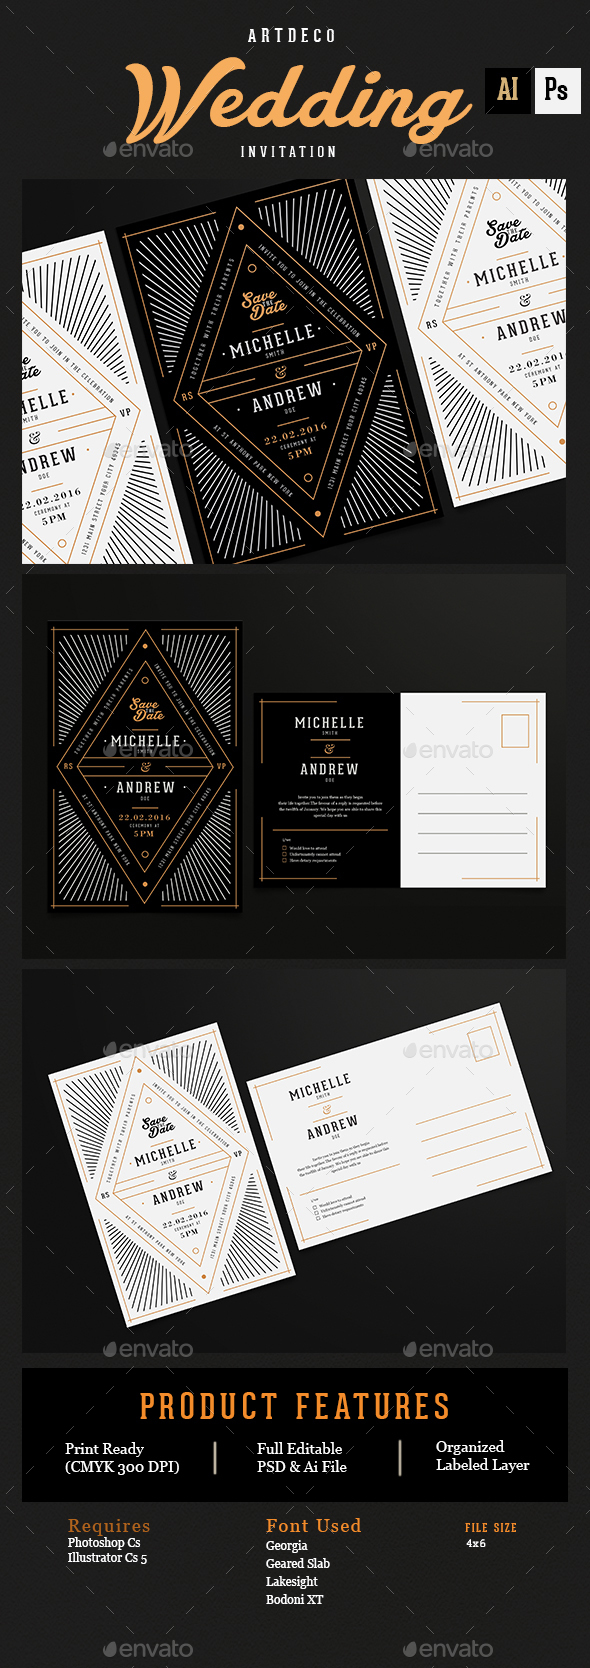 Art Deco Wedding Invitation/Card by Guuver | GraphicRiver